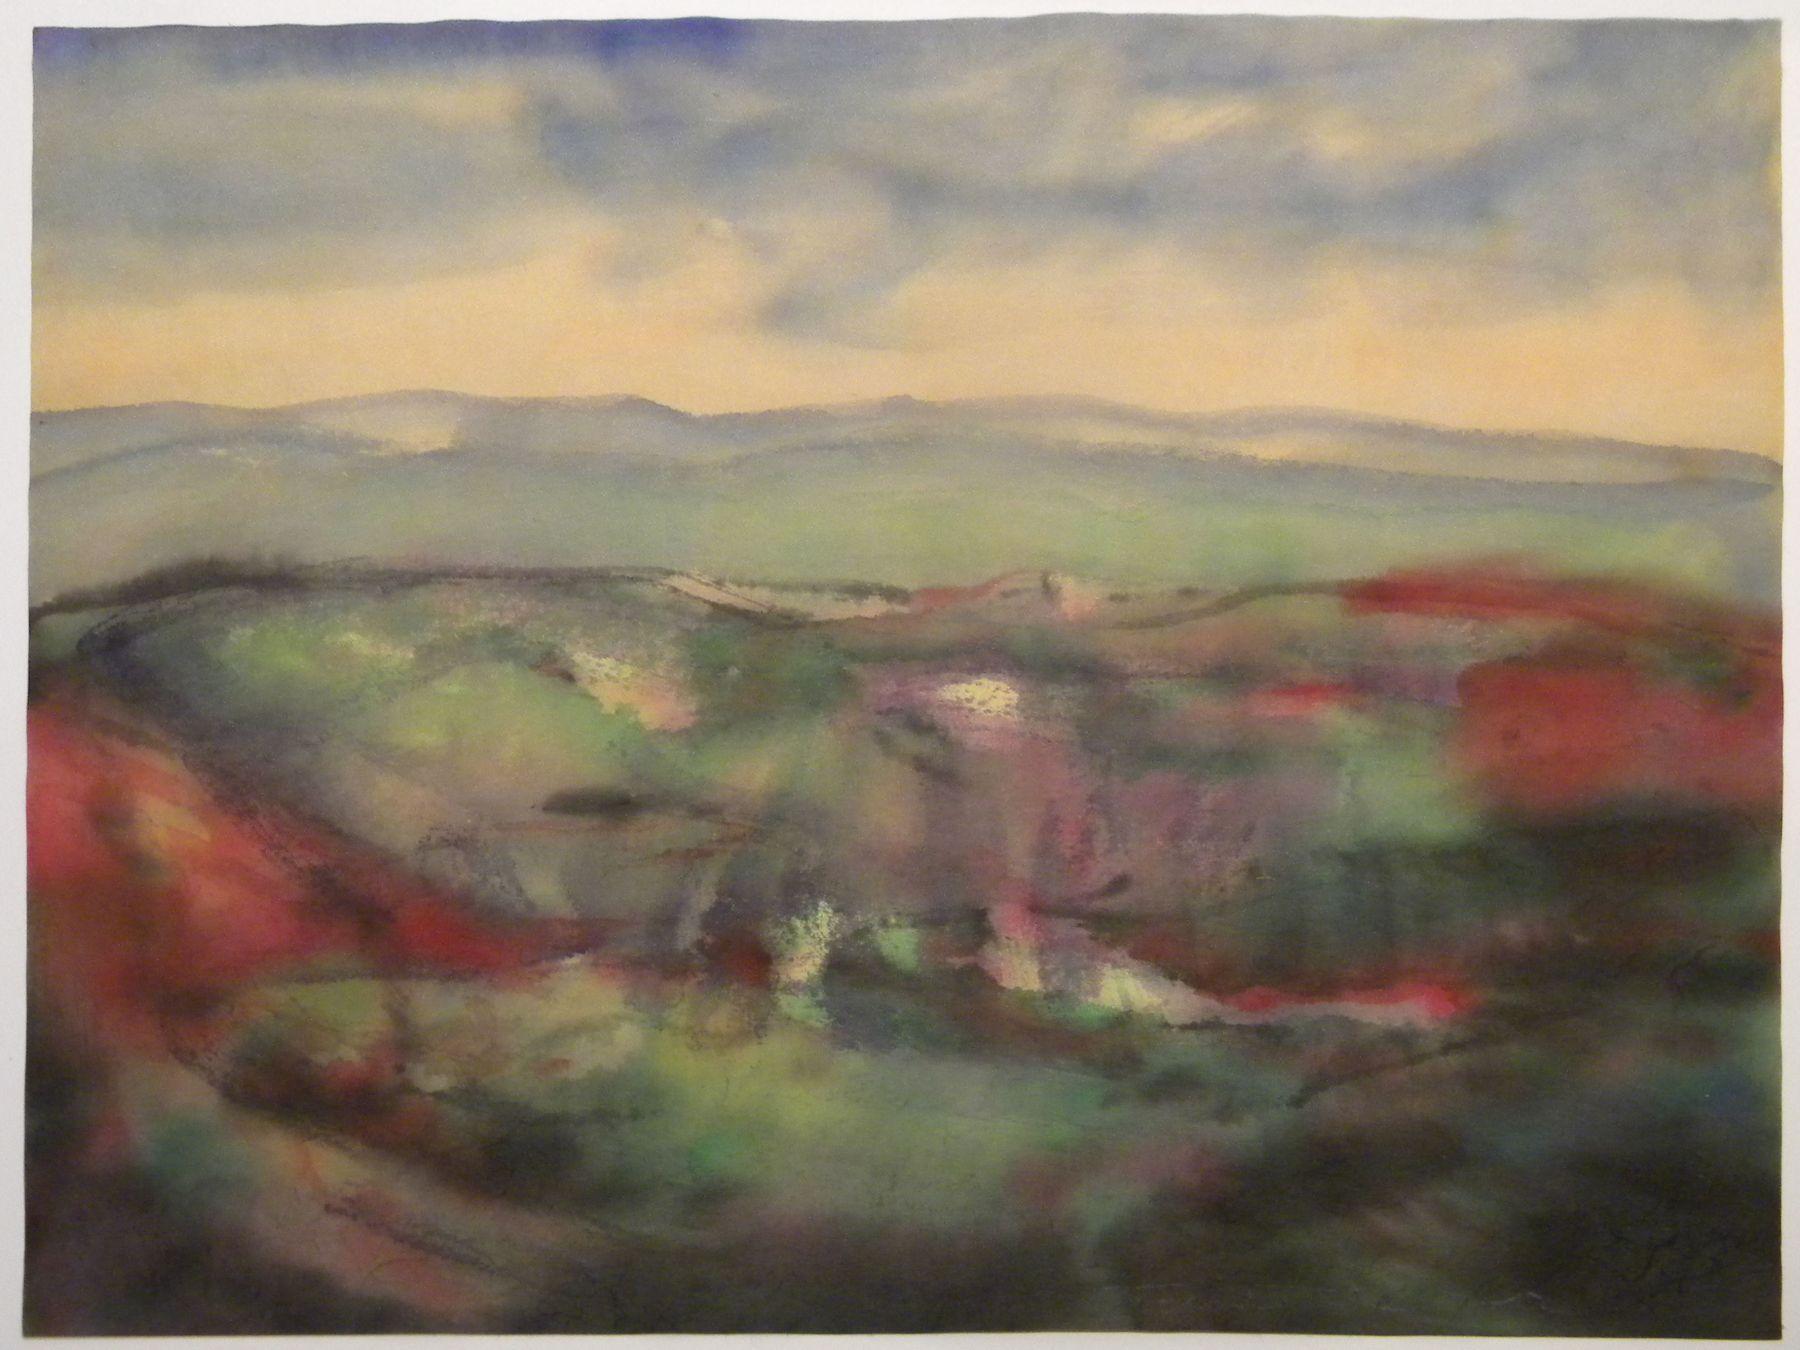 Fulvio Testa, Untitled 13, 2012    Watercolor on paper 13 3/8 x 15 7/8 inches